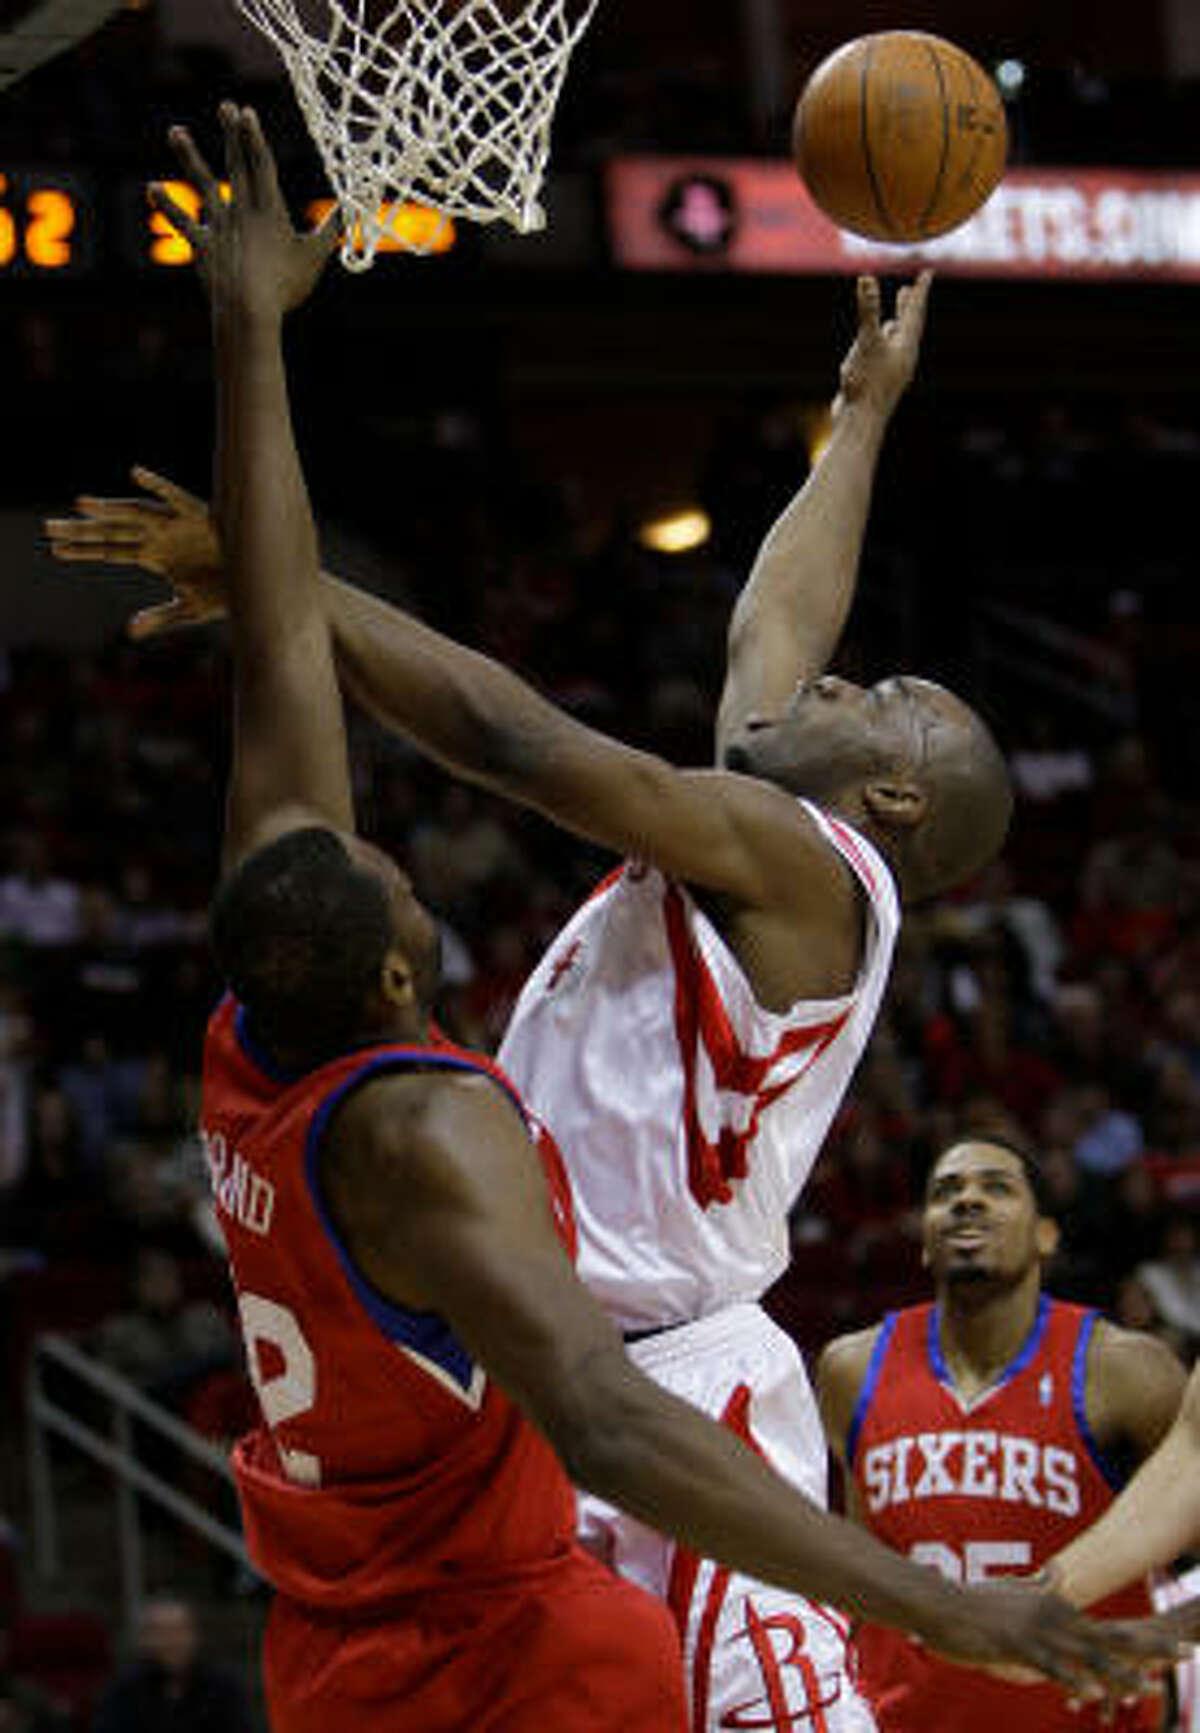 Houston Rockets (14) Carl Landry tries to get to the basket over Philadelphia 76ers (42) Elton Brand on Saturday, Feb. 6, 2010, in Houston.